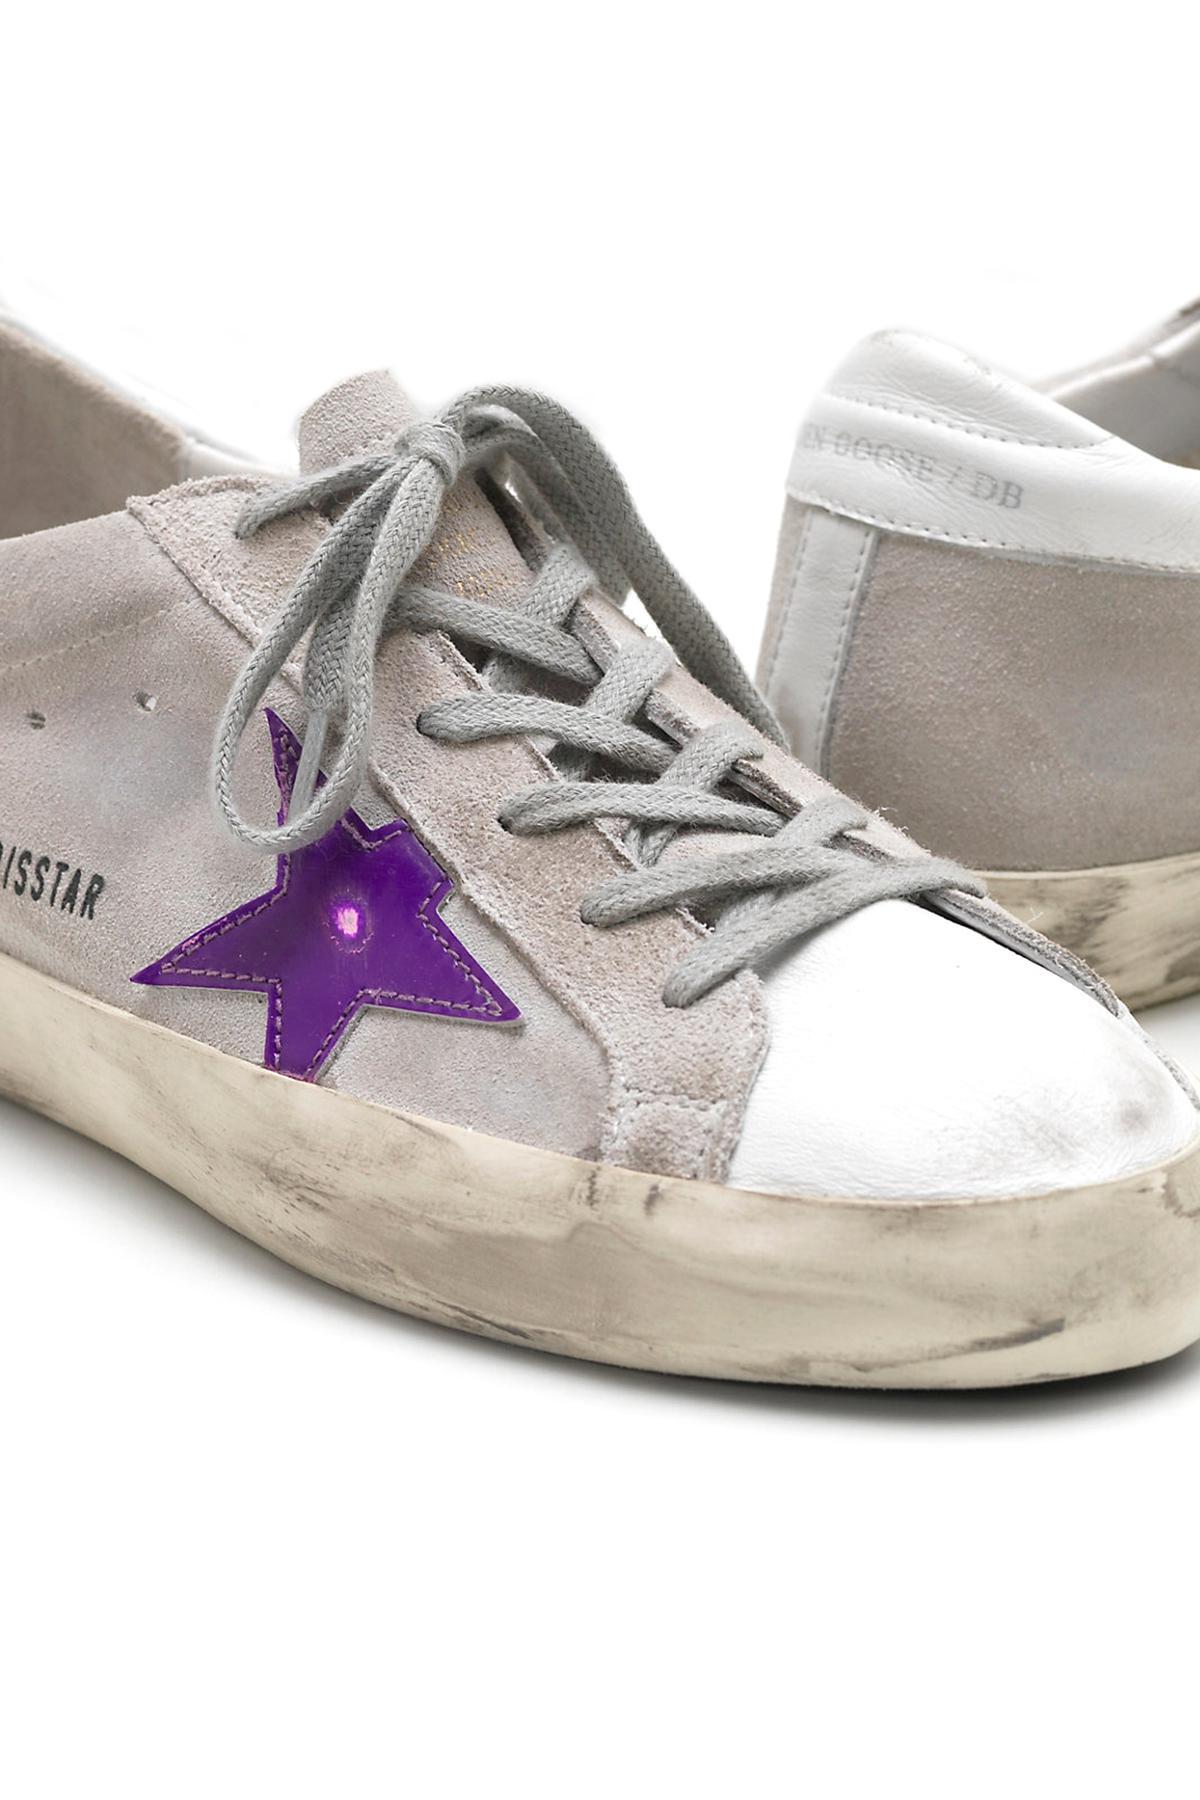 Salida 100% Garantizado Códigos De Descuento En Línea De Compras Golden Goose Deluxe Brand logo ankle boots - Rosa & Viola Comprar Barato Cómoda wcg9t